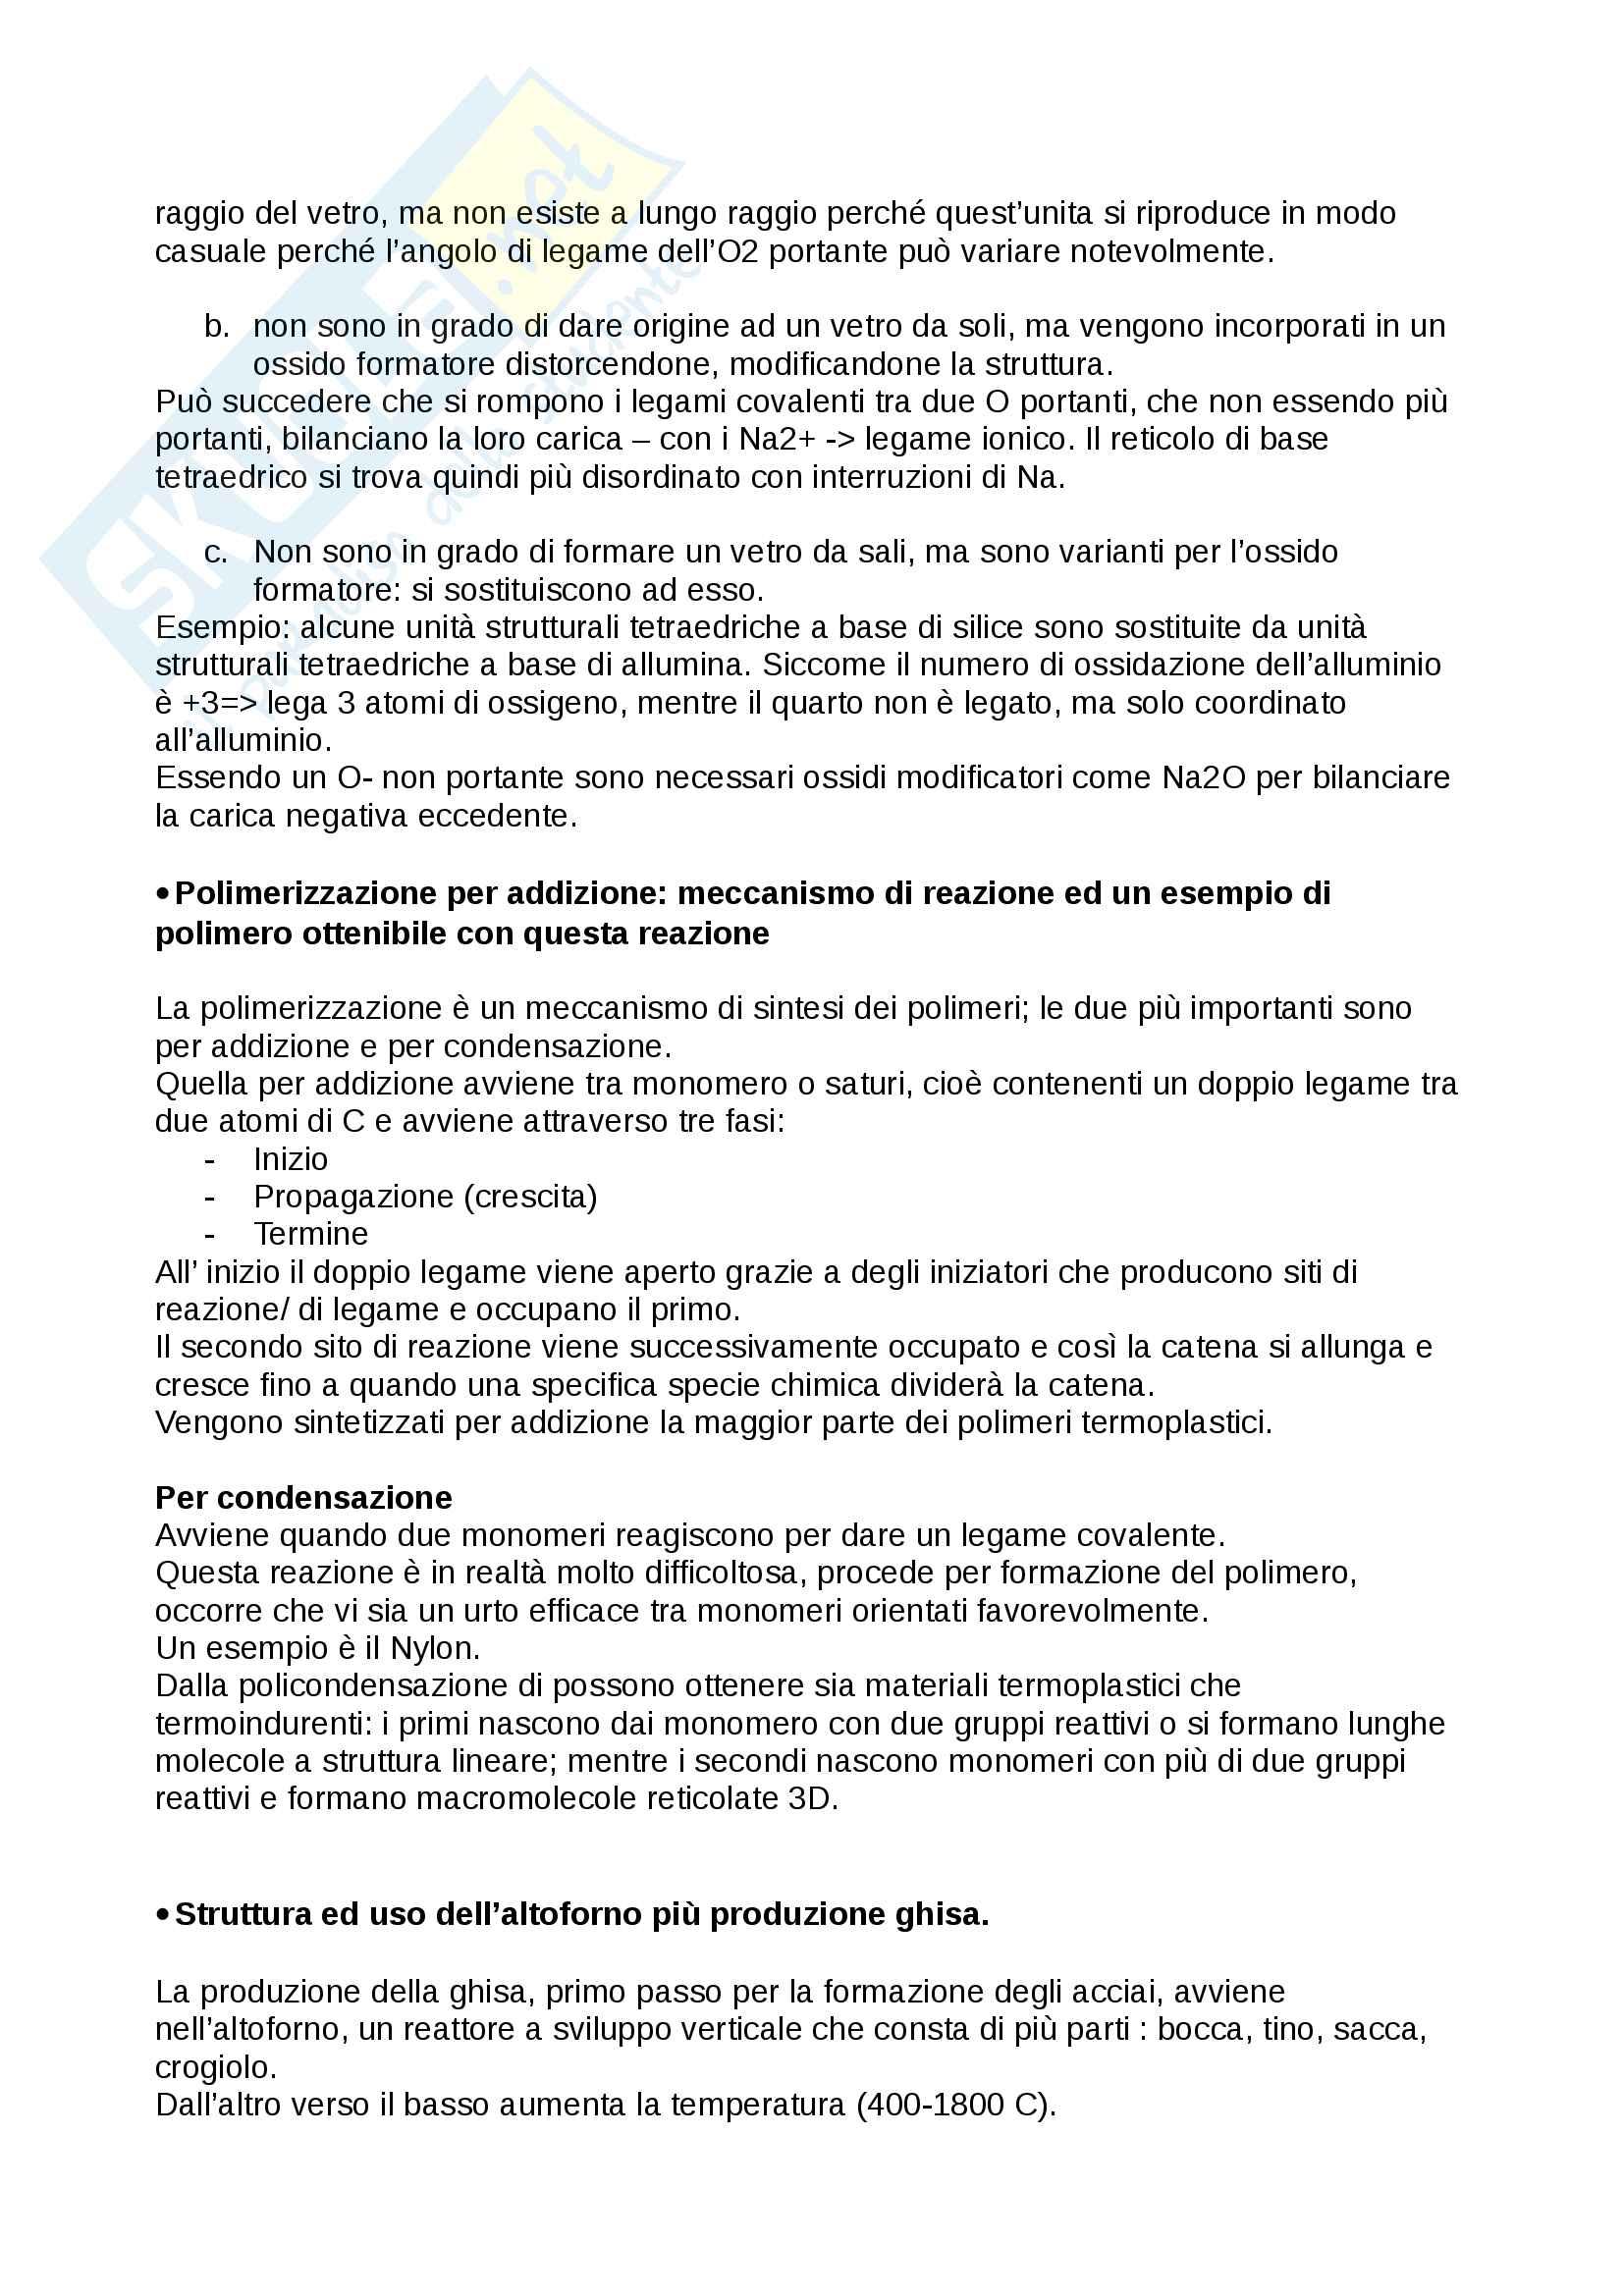 Scienze dei materiali: domande esame - Verné Pag. 6